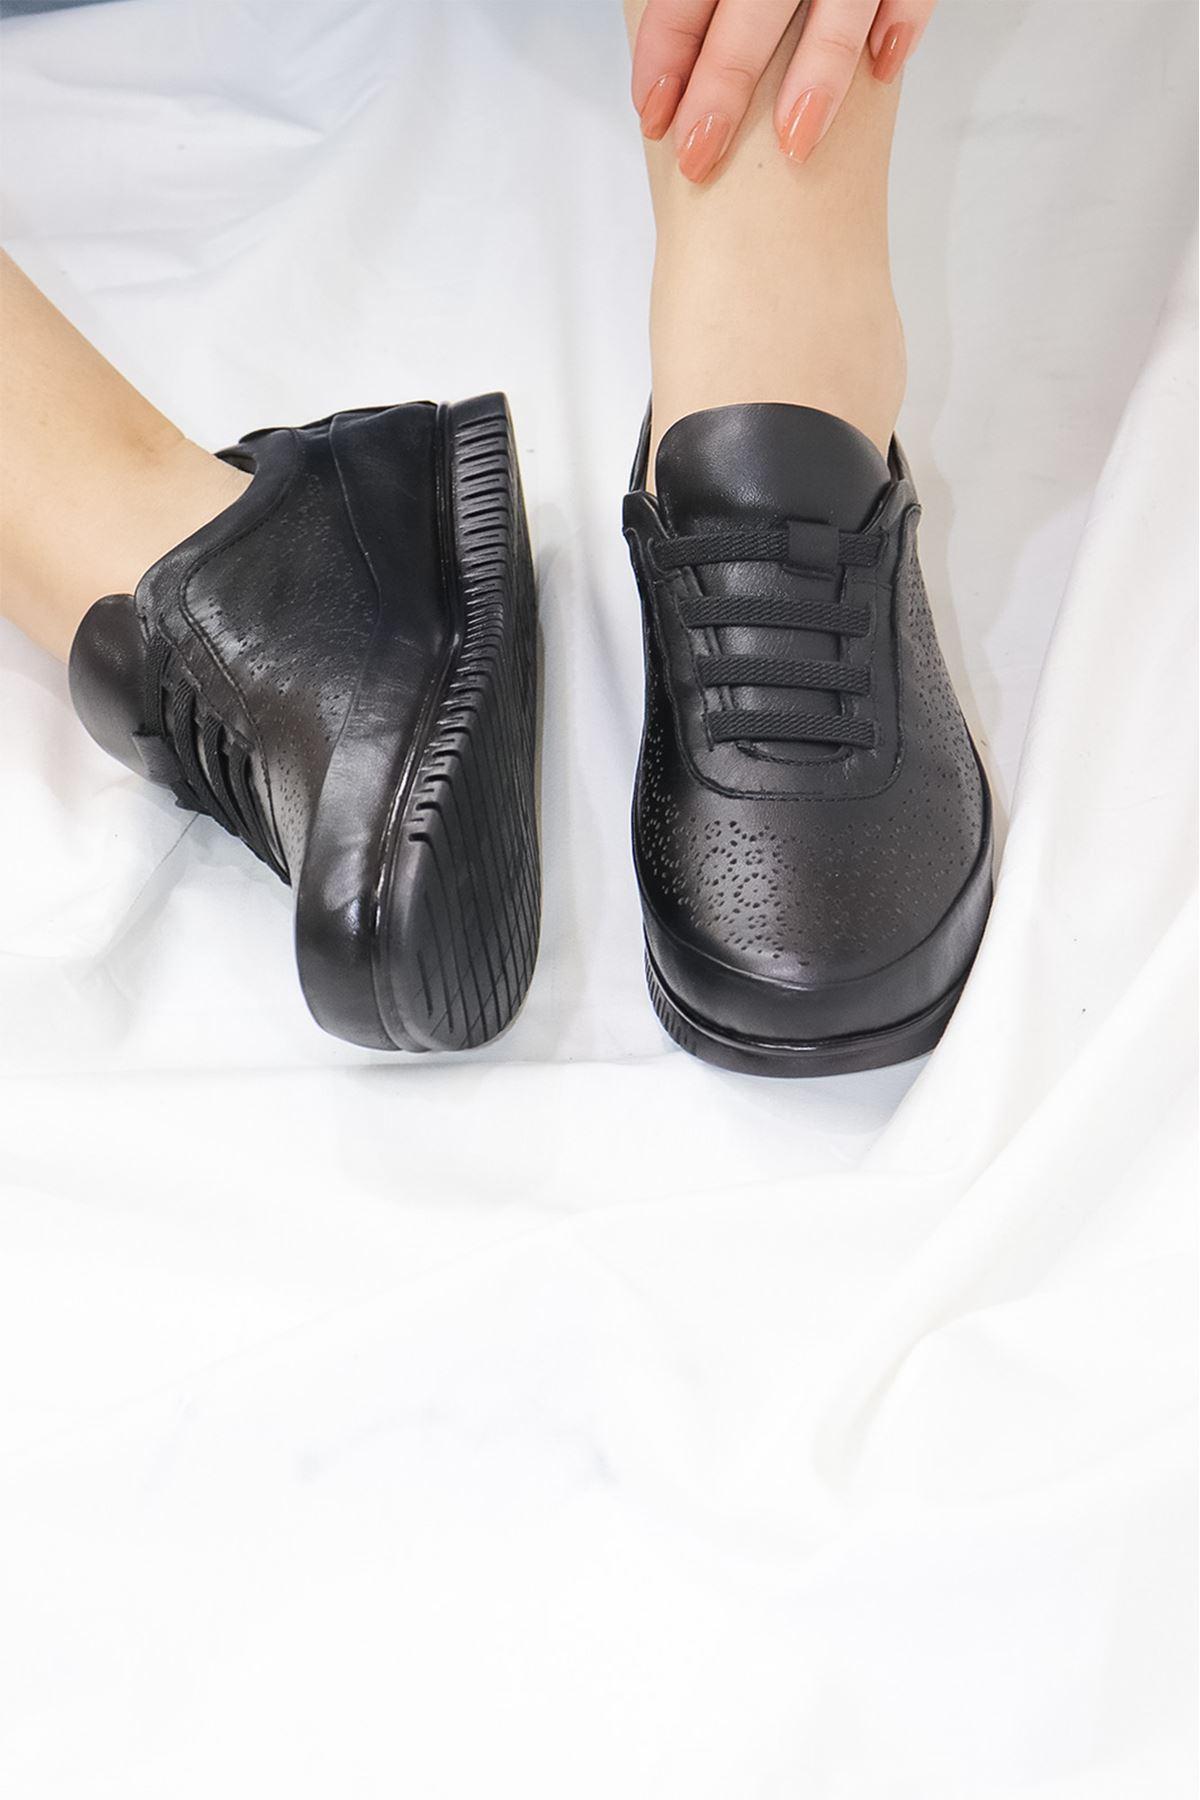 Mammamia - D21YA - 125 Siyah Kadın Ayakkabısı